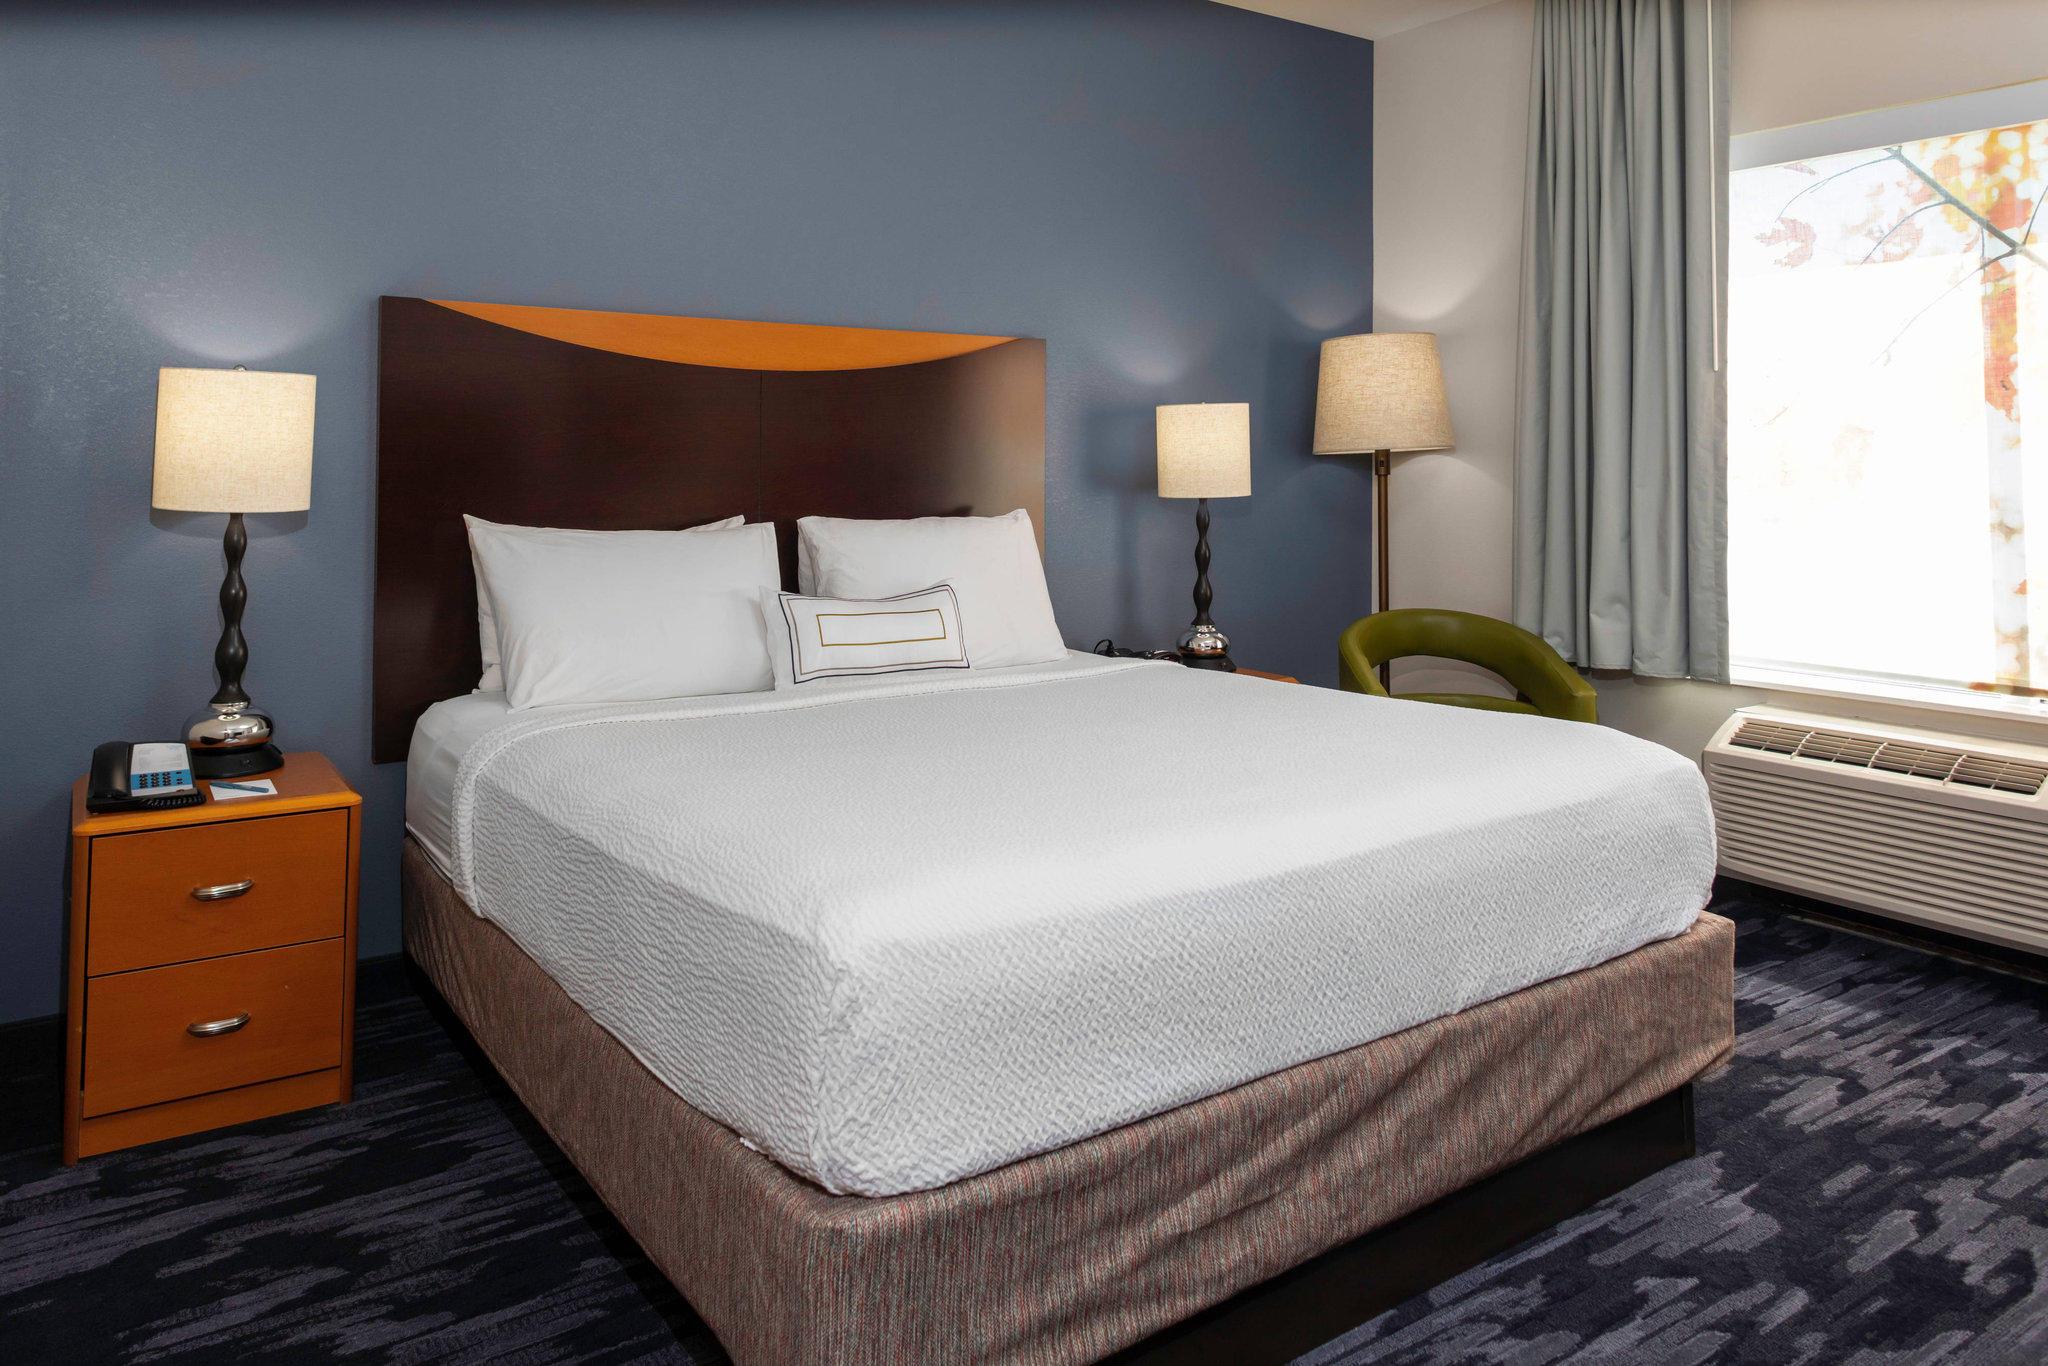 Fairfield Inn & Suites by Marriott Wichita Downtown